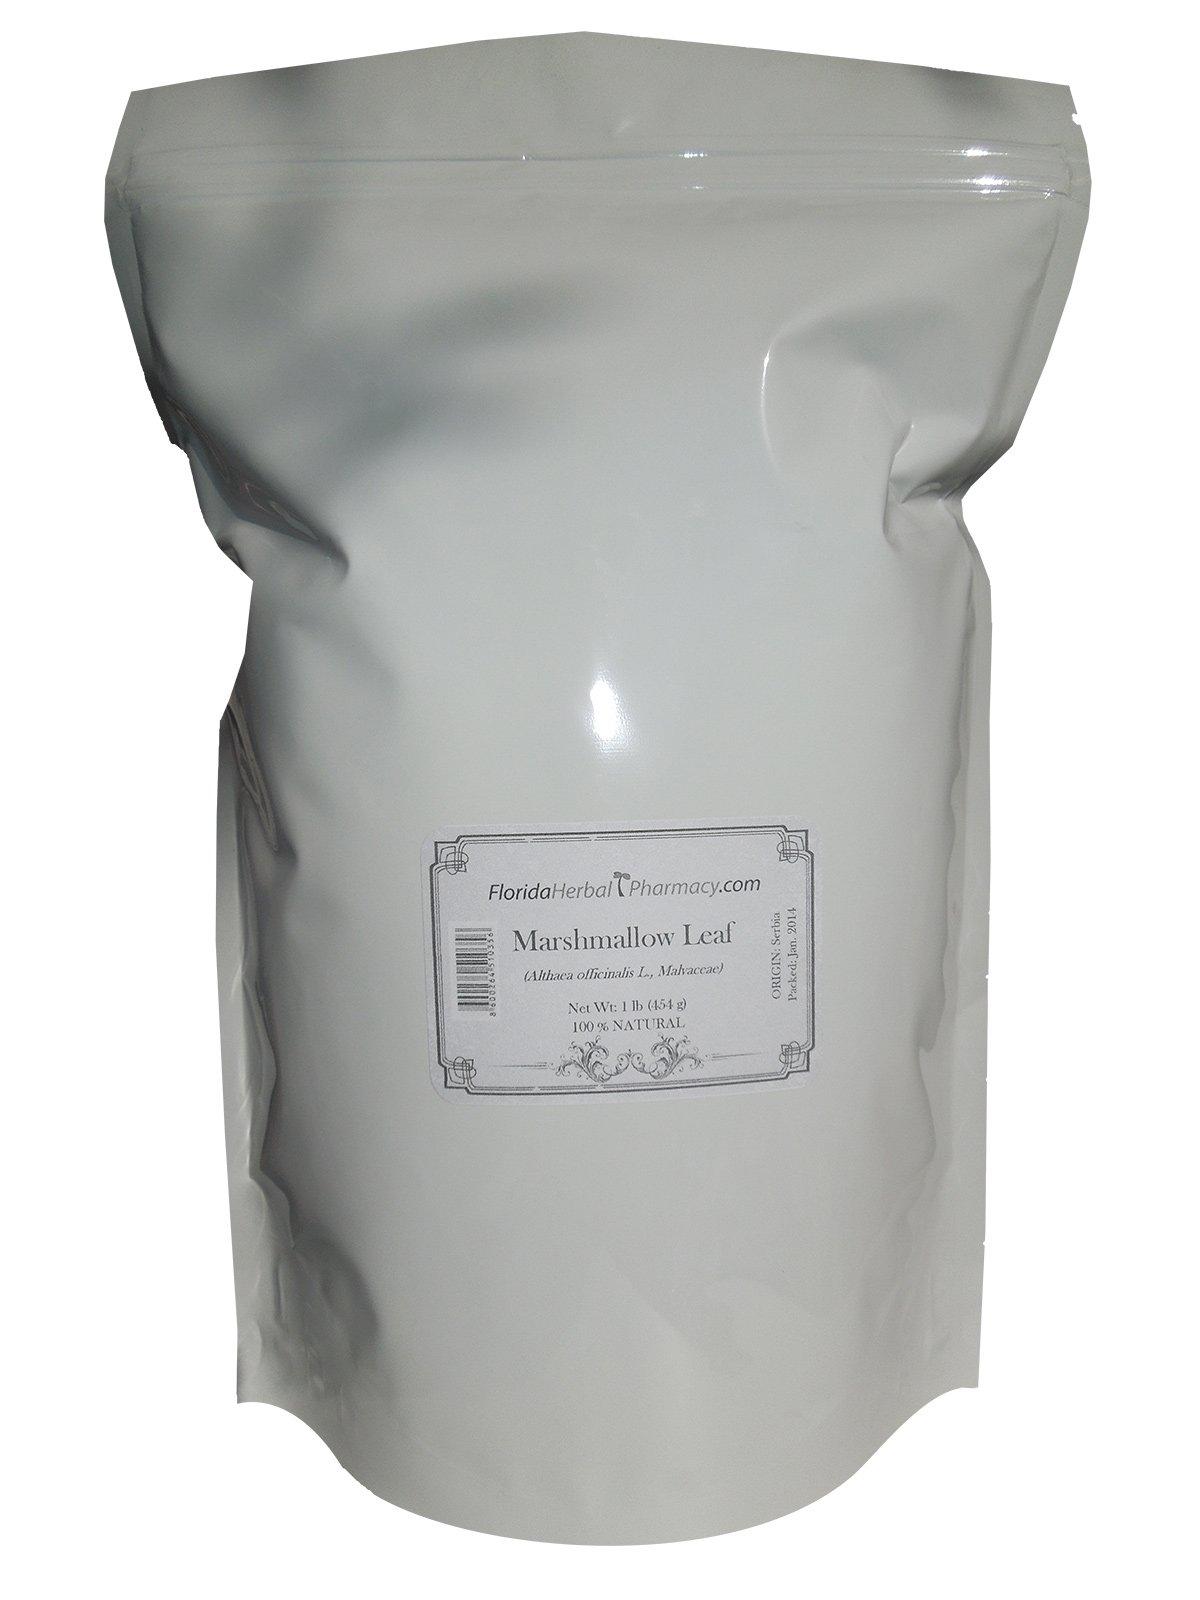 Florida Herbal Pharmacy, Marshmallow Leaf Tea, 1 Lb (16 oz)